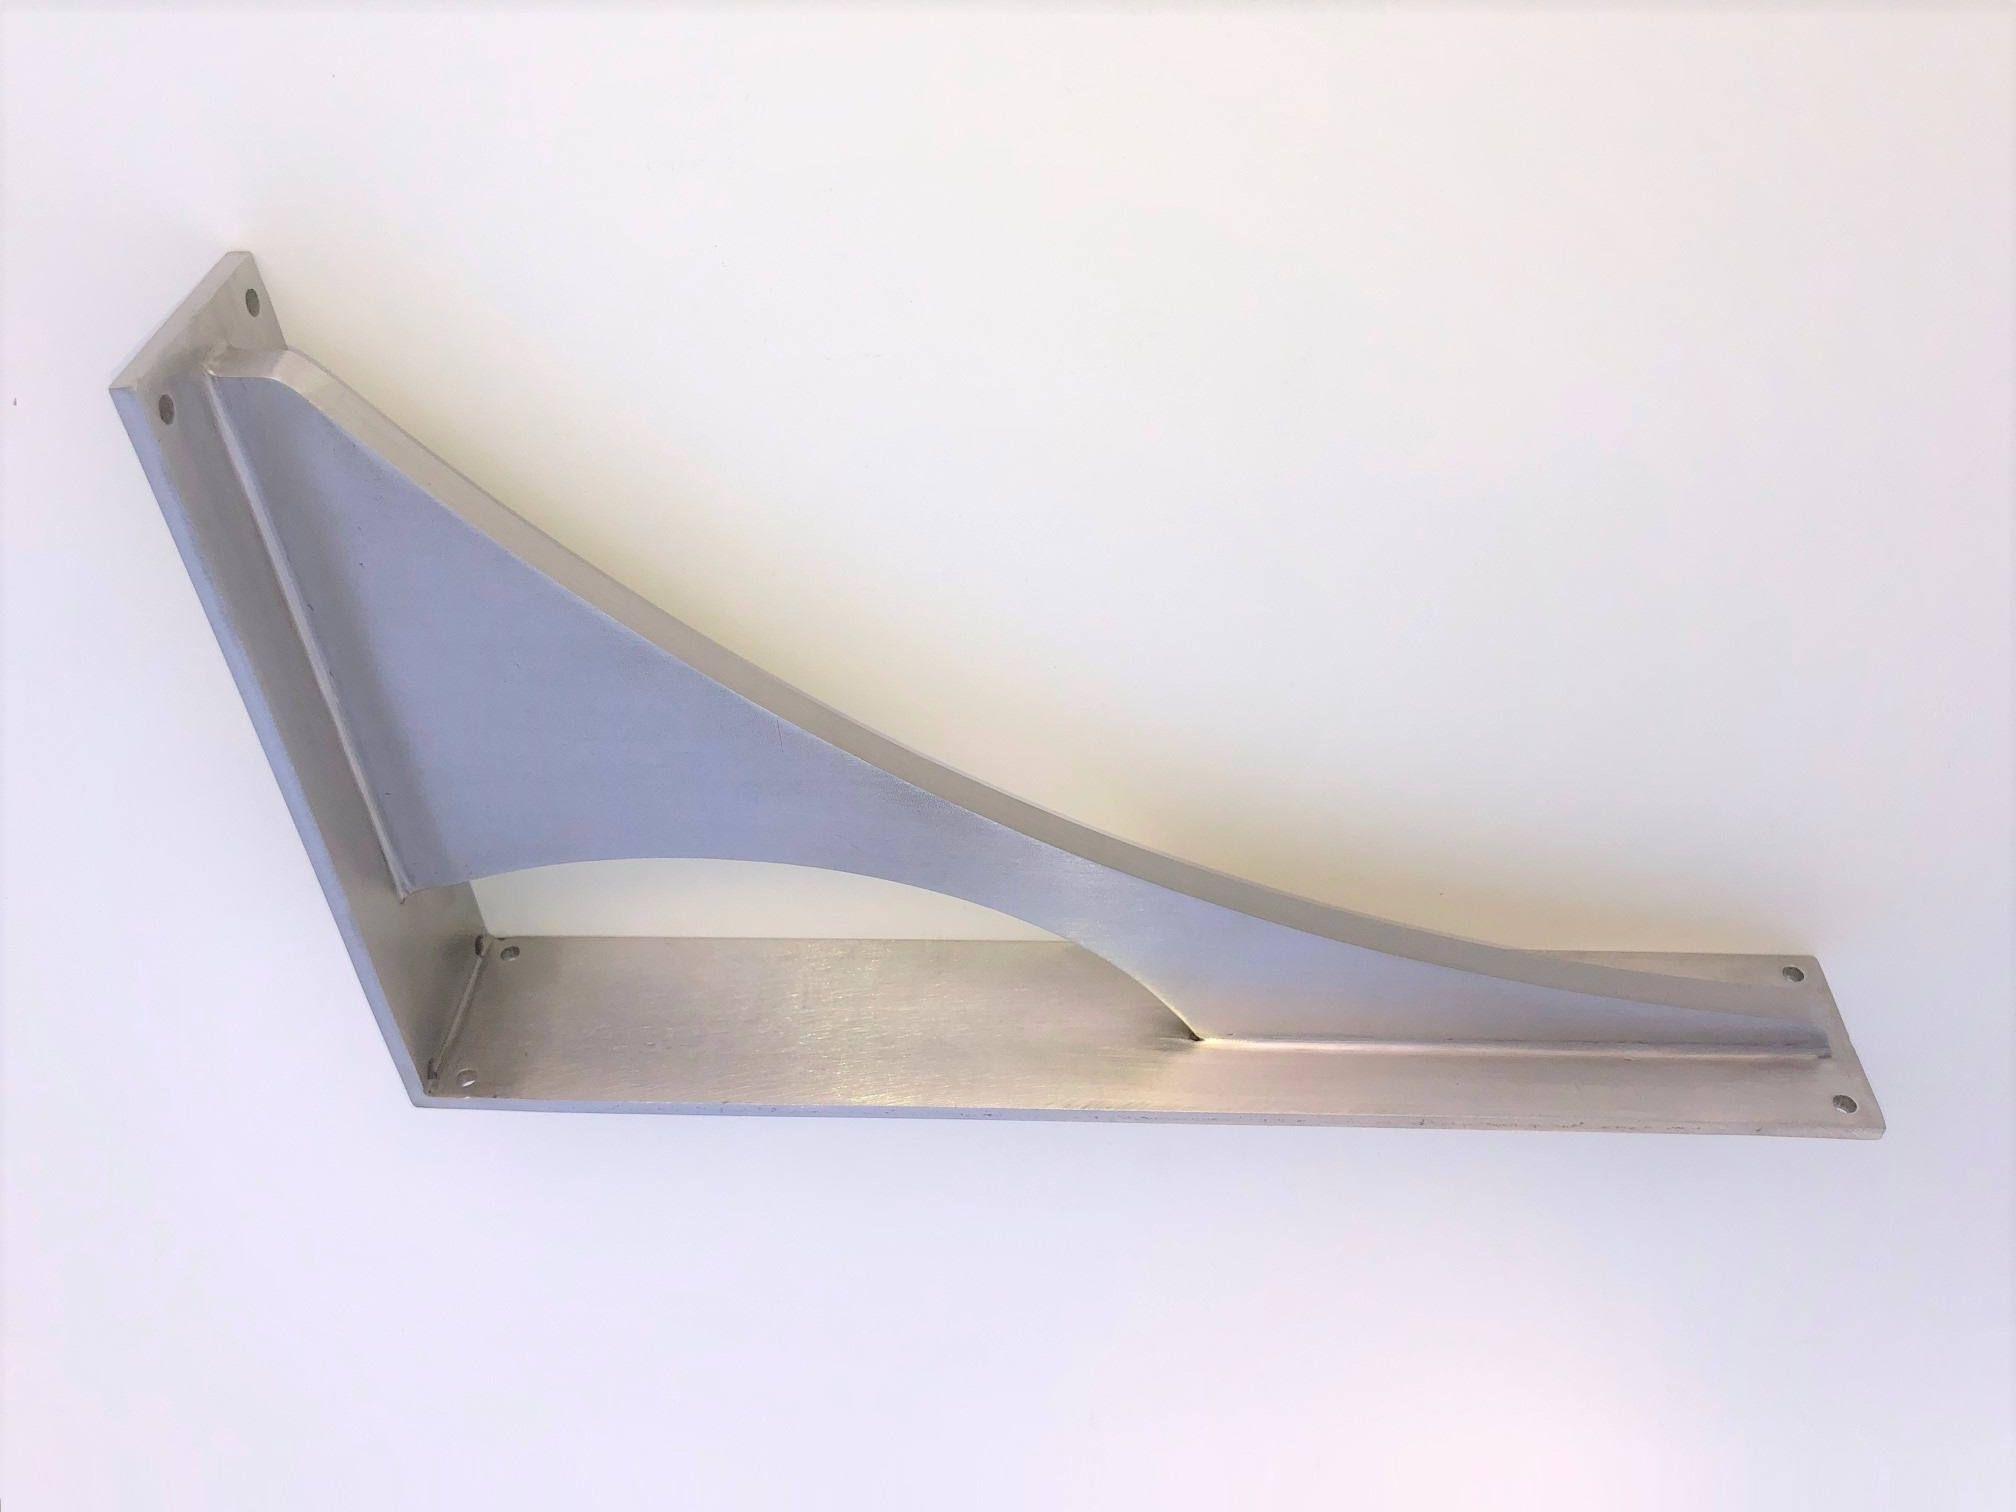 Stainless Steel Countertop Brackets Large Shelf Brackets